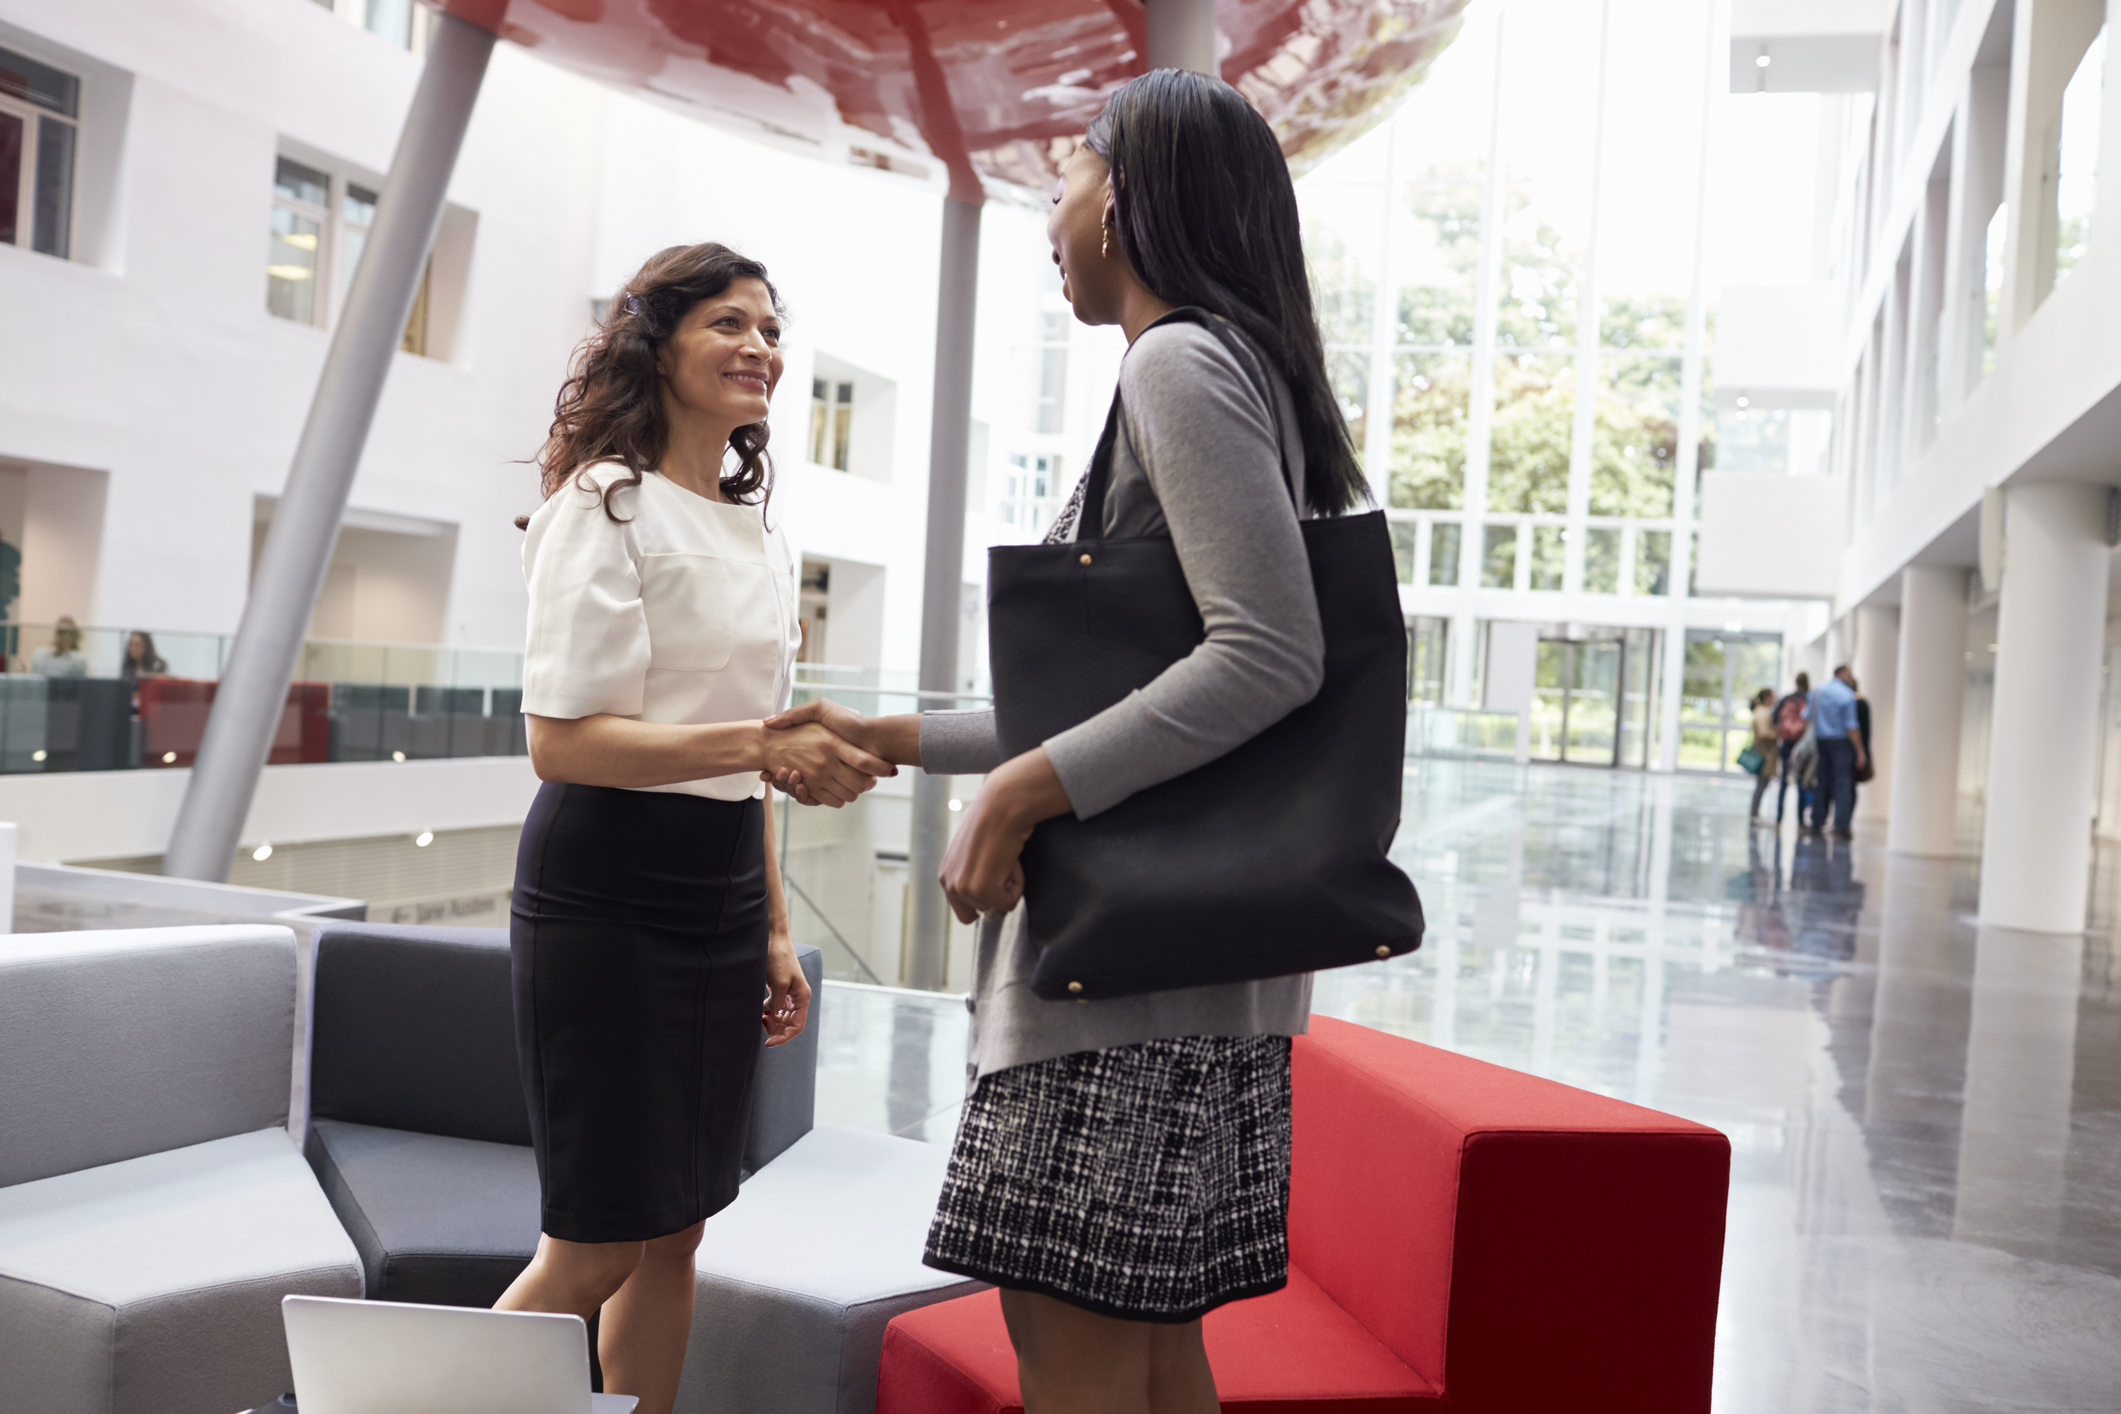 Stock photo of two businesswomen shaking hands